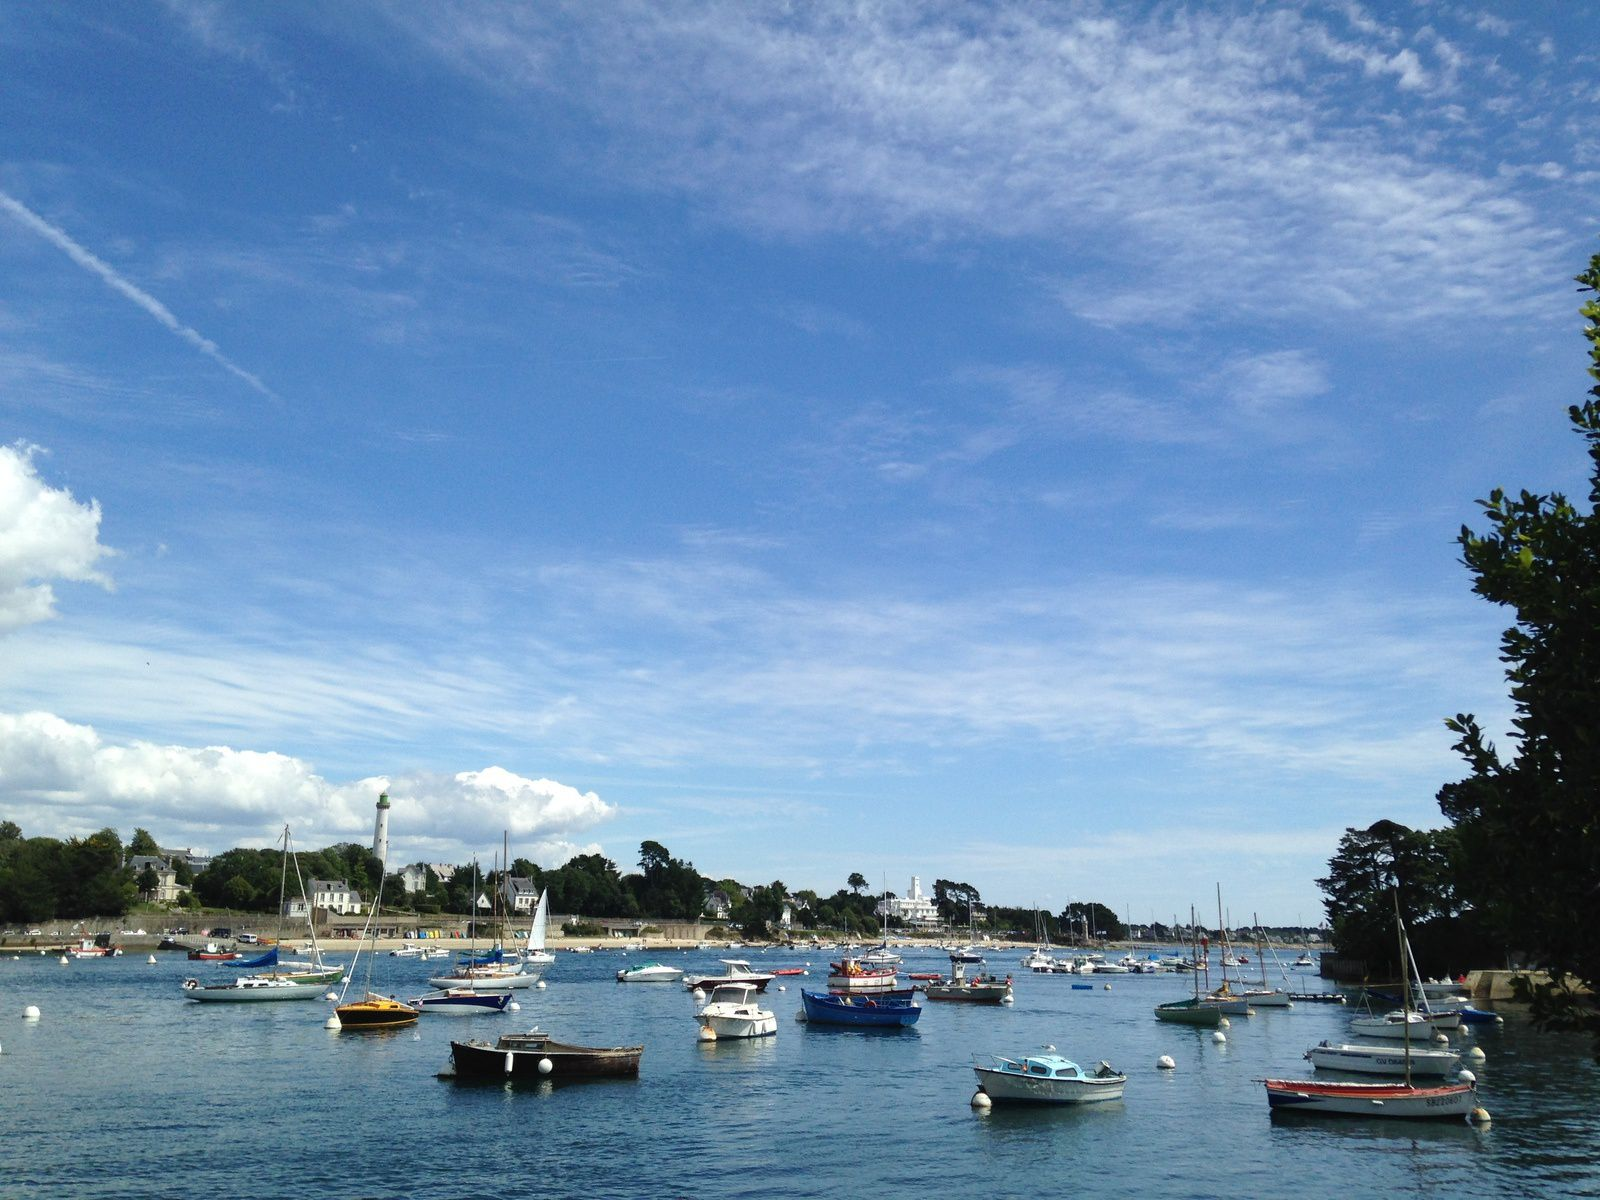 #saintemarine #bretagne #finistere #france #charlotteblabla blog